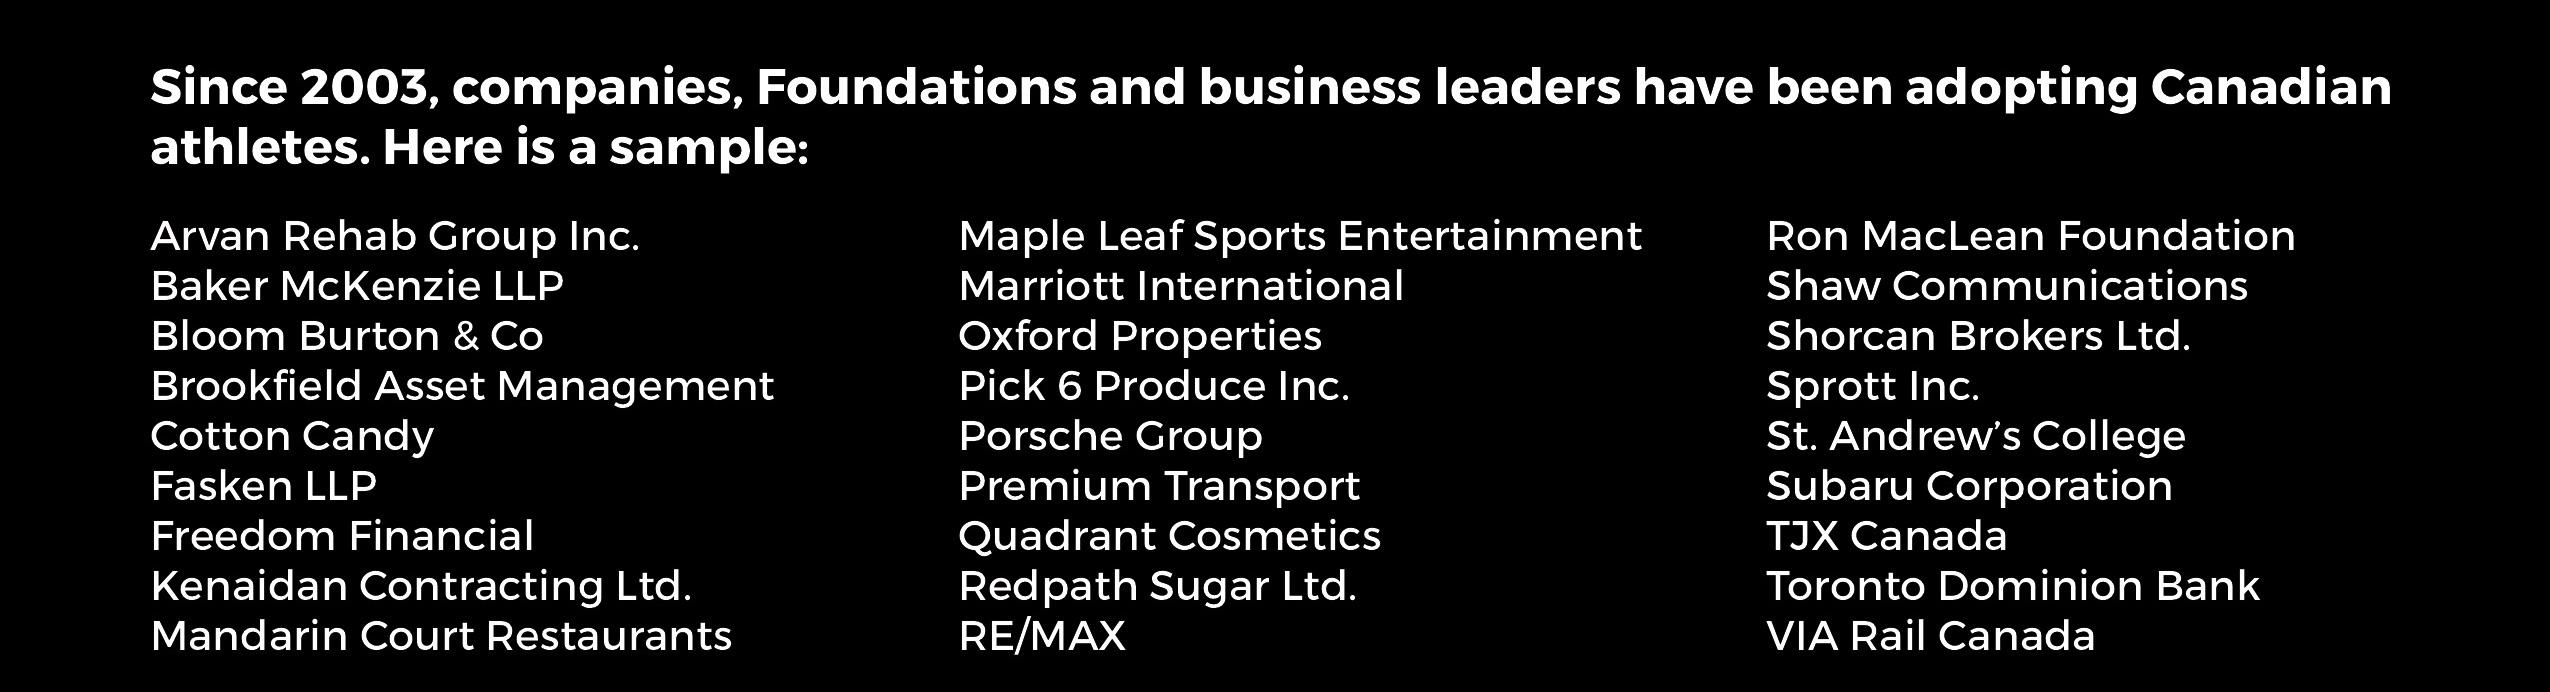 companies NEW